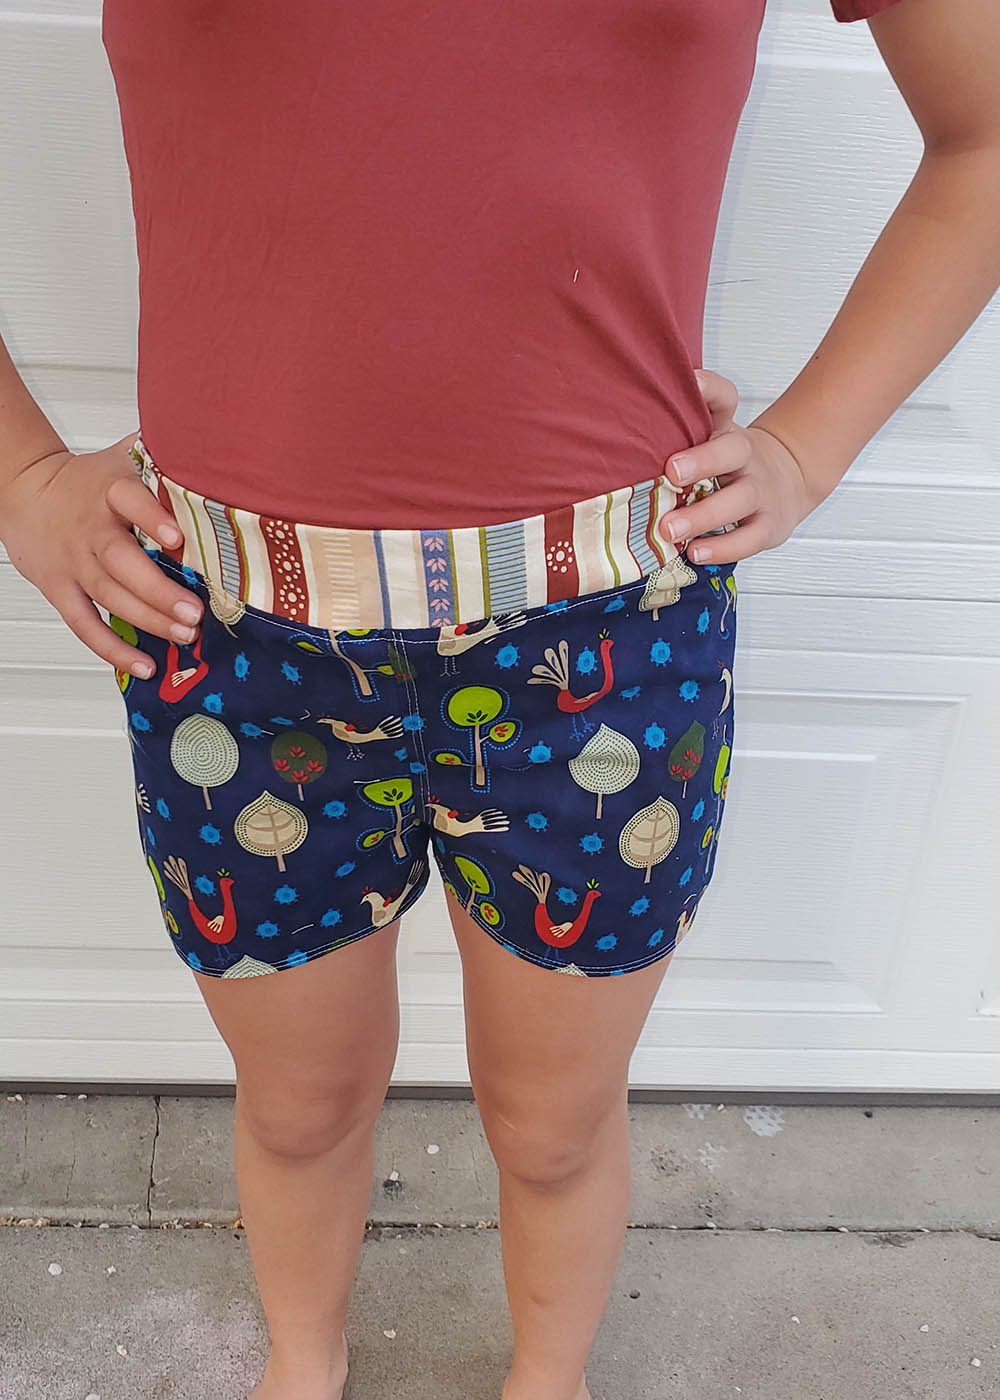 Helia's Hot Pants Sizes 2T to 14 Kids PDF Pattern